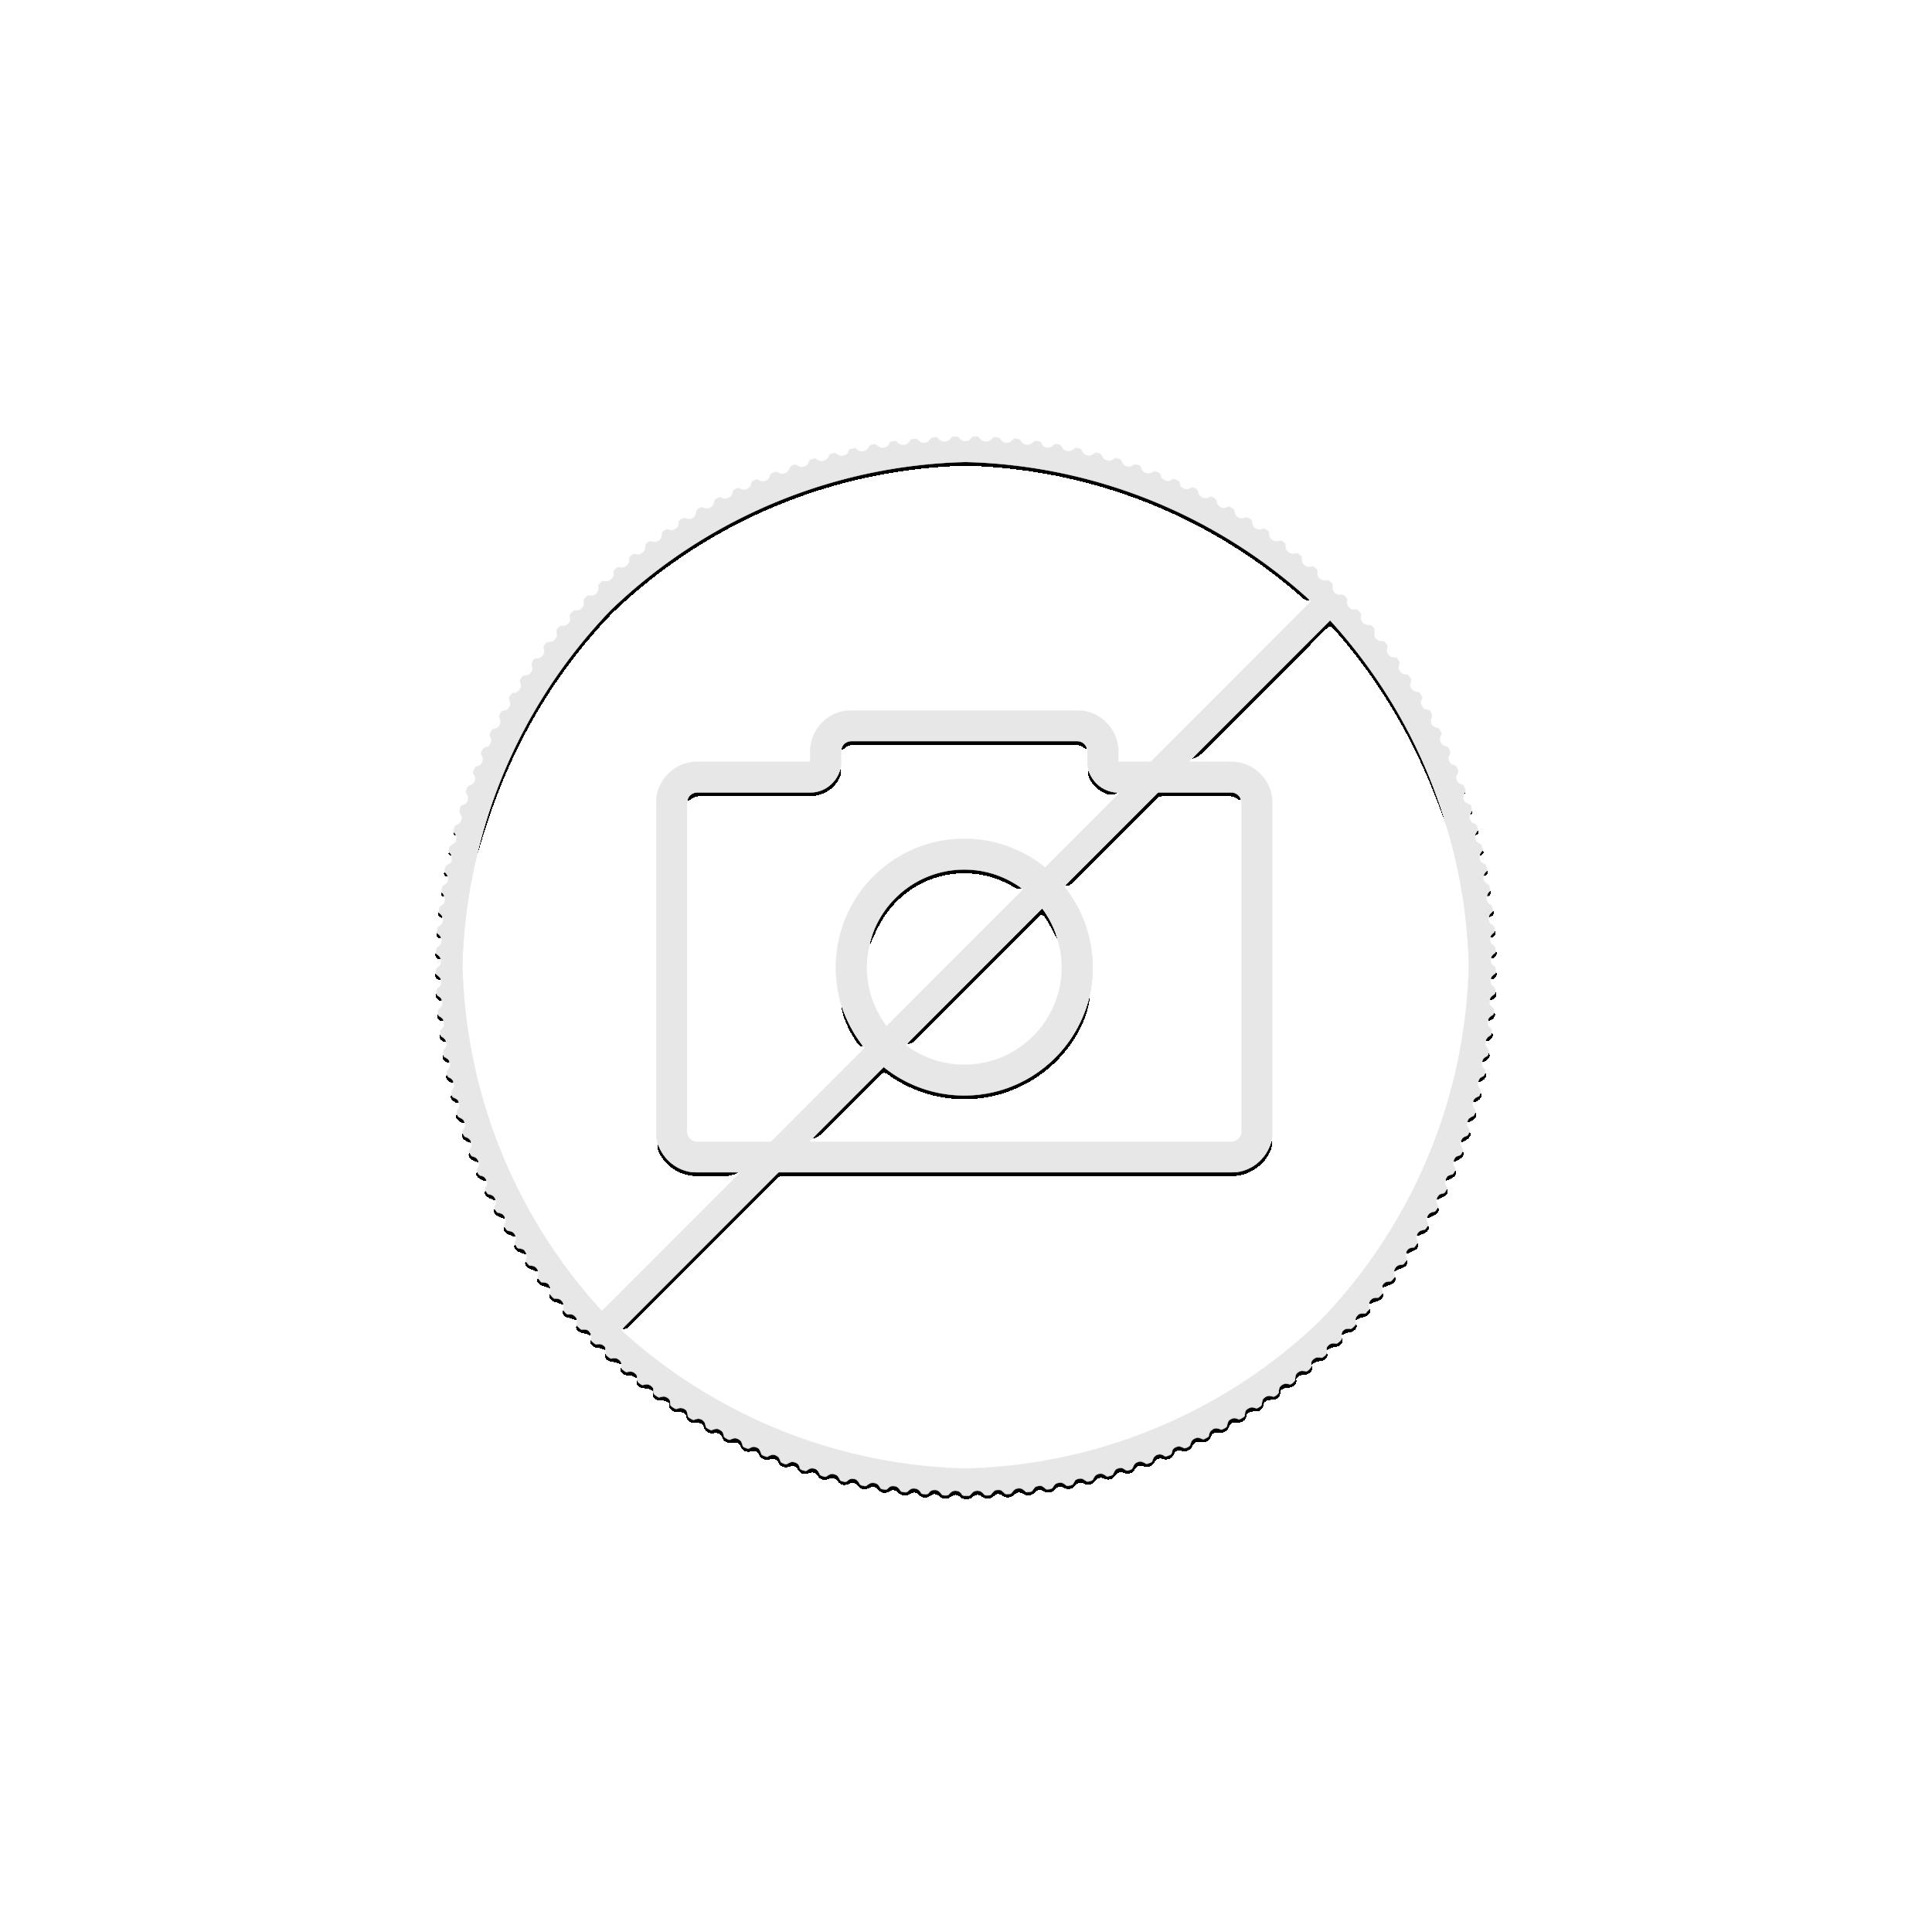 Gouden Maple Leaf munt voorgaande jaargangen